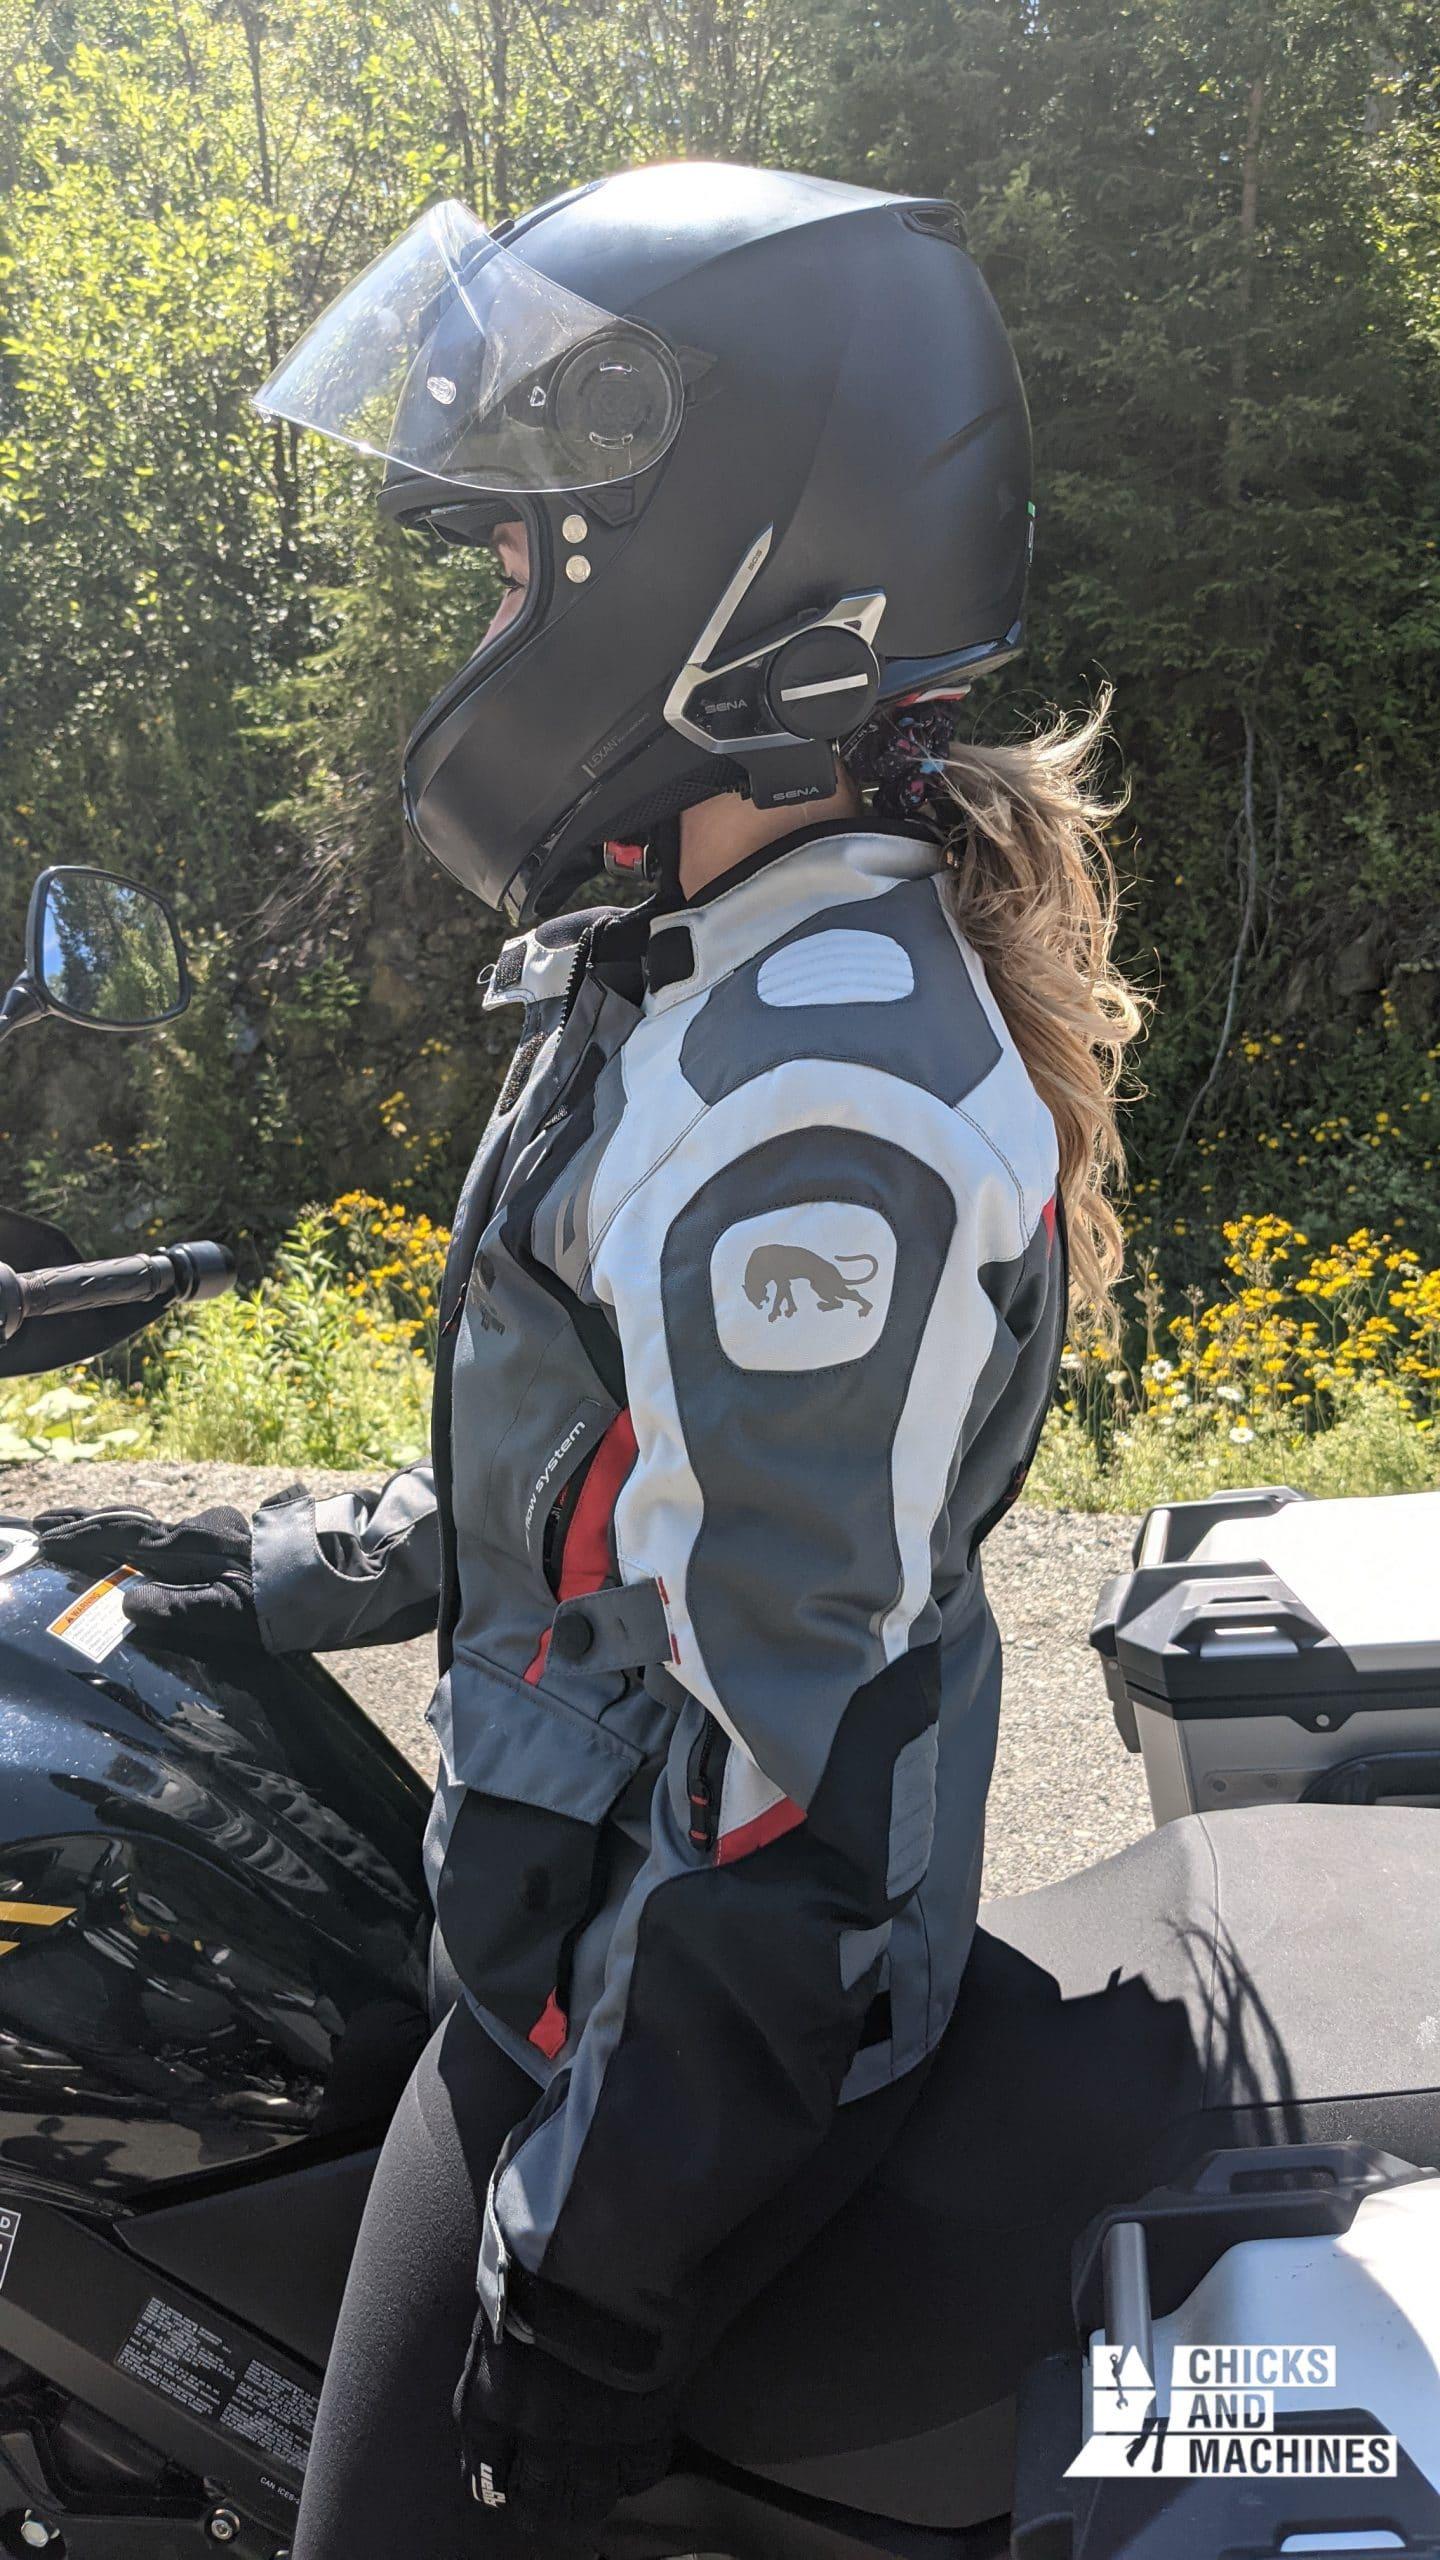 The Sena 50S is easily worn over any helmet!